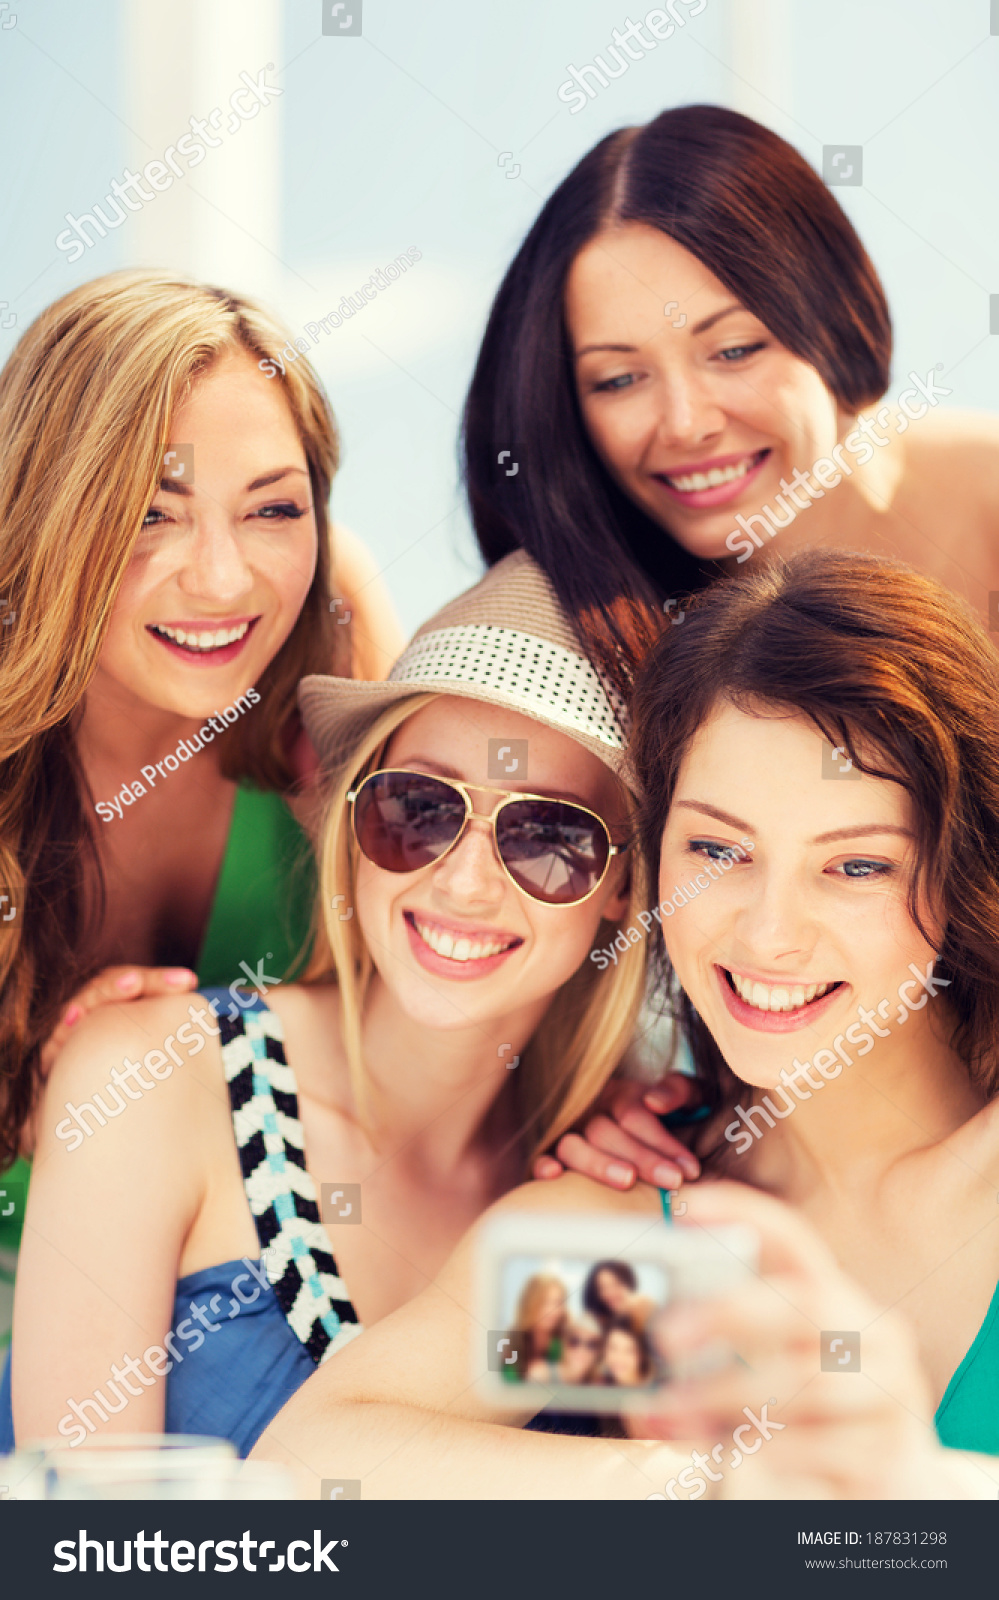 Summer Holidays Vacation Girls Taking Selfie Stock Photo